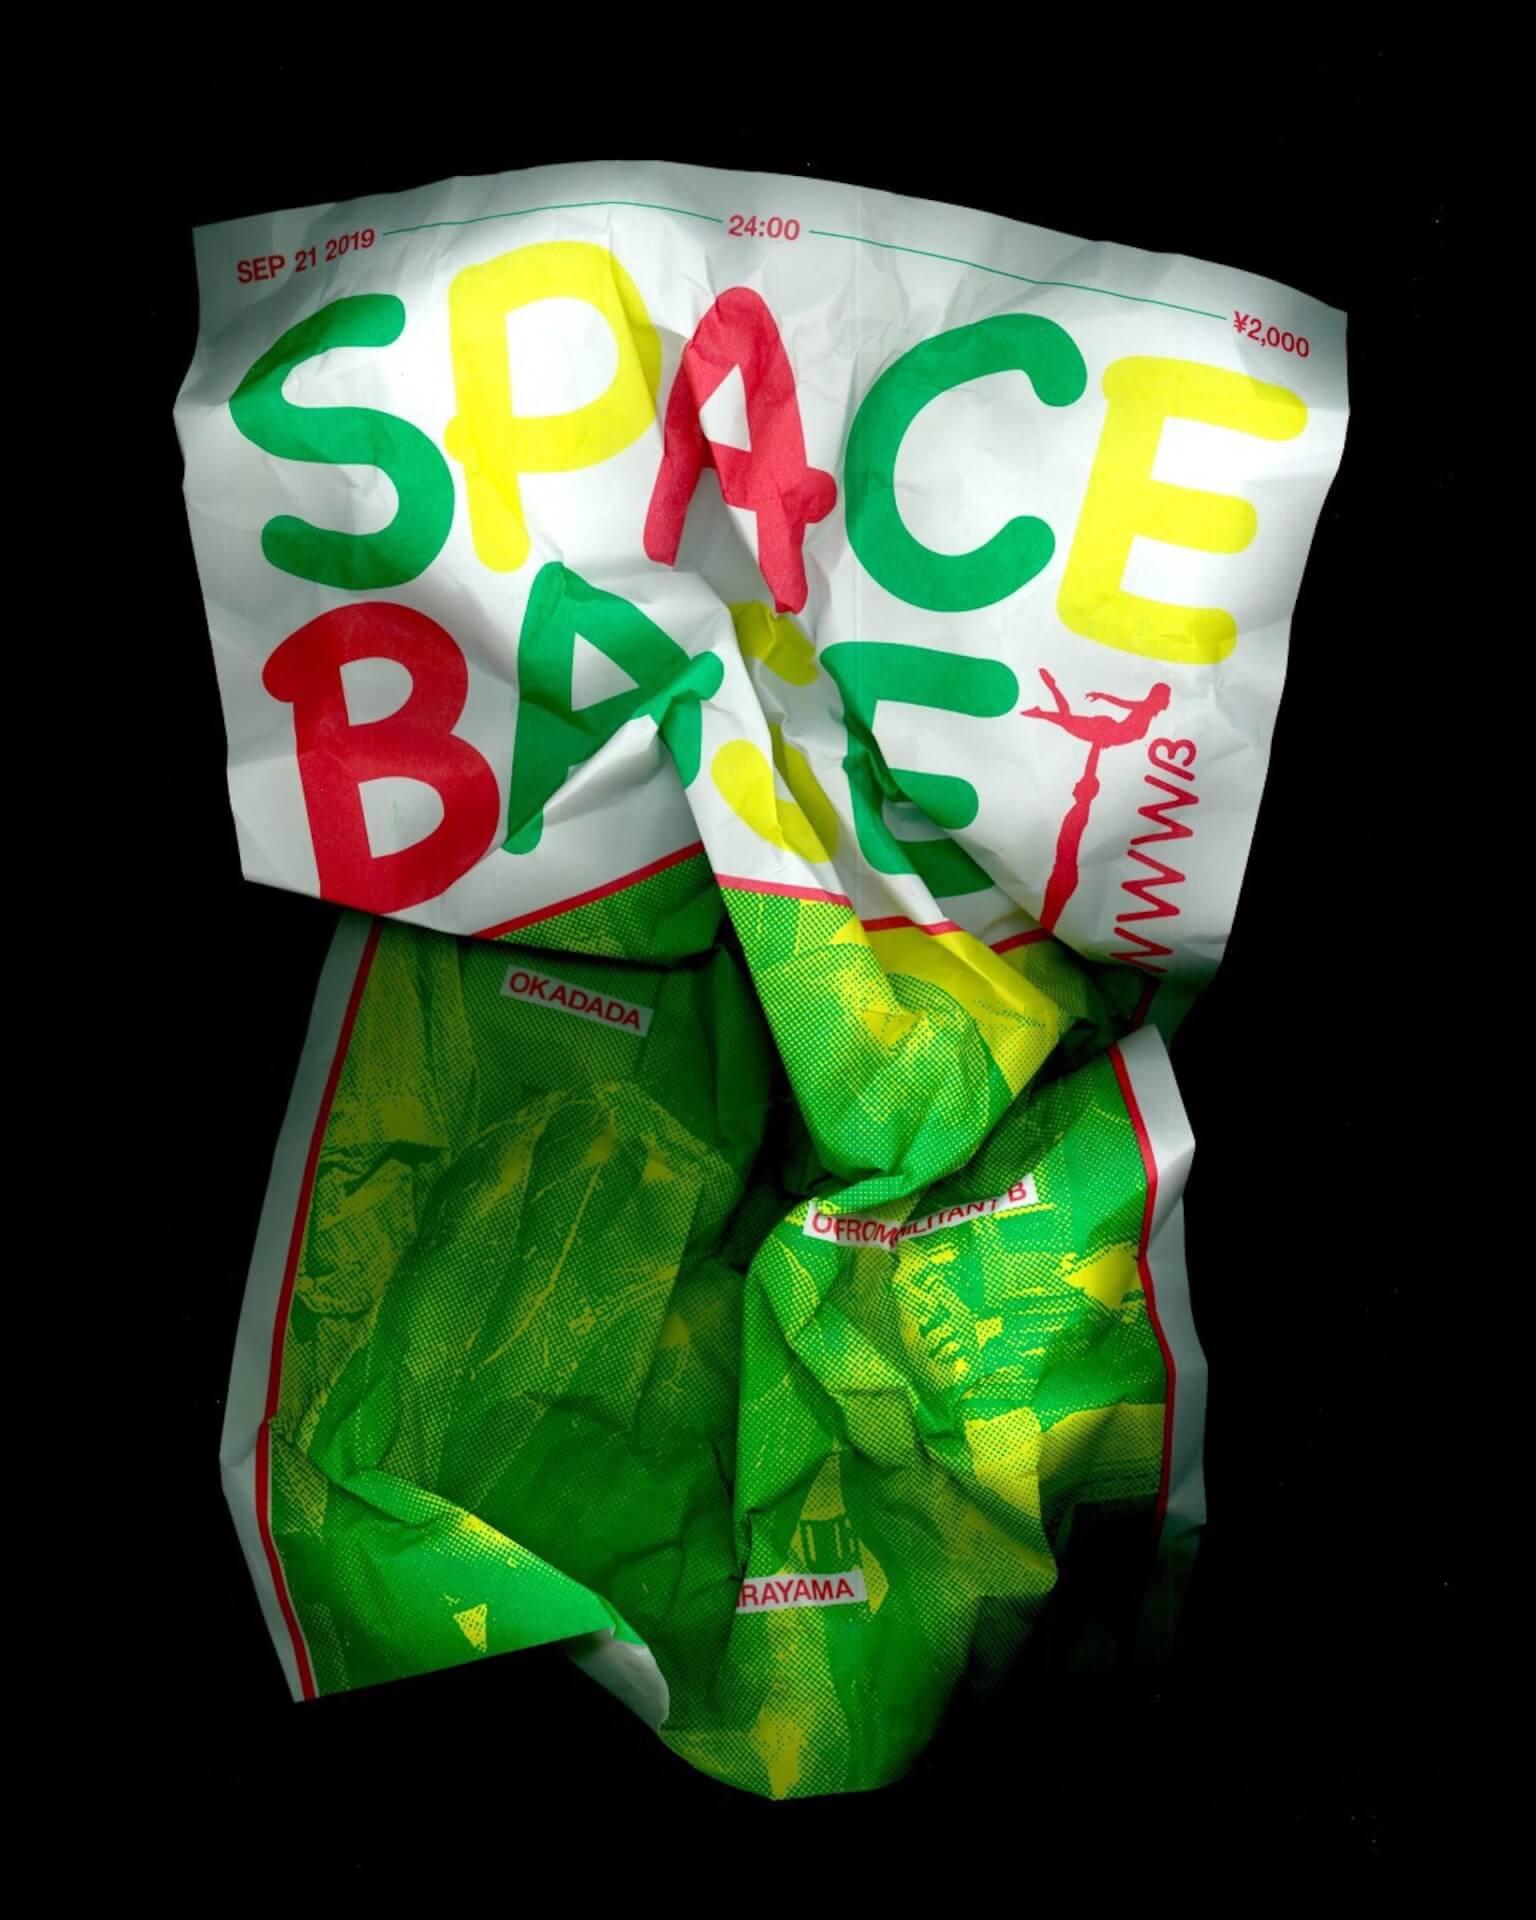 okadada、KIRAYAMA、OG from Militant Bと絶大な信頼を得る86年生のDJ3者が集う<SPACE BASE>第2回が9月にWWWβで開催 music190828-spacebase-5